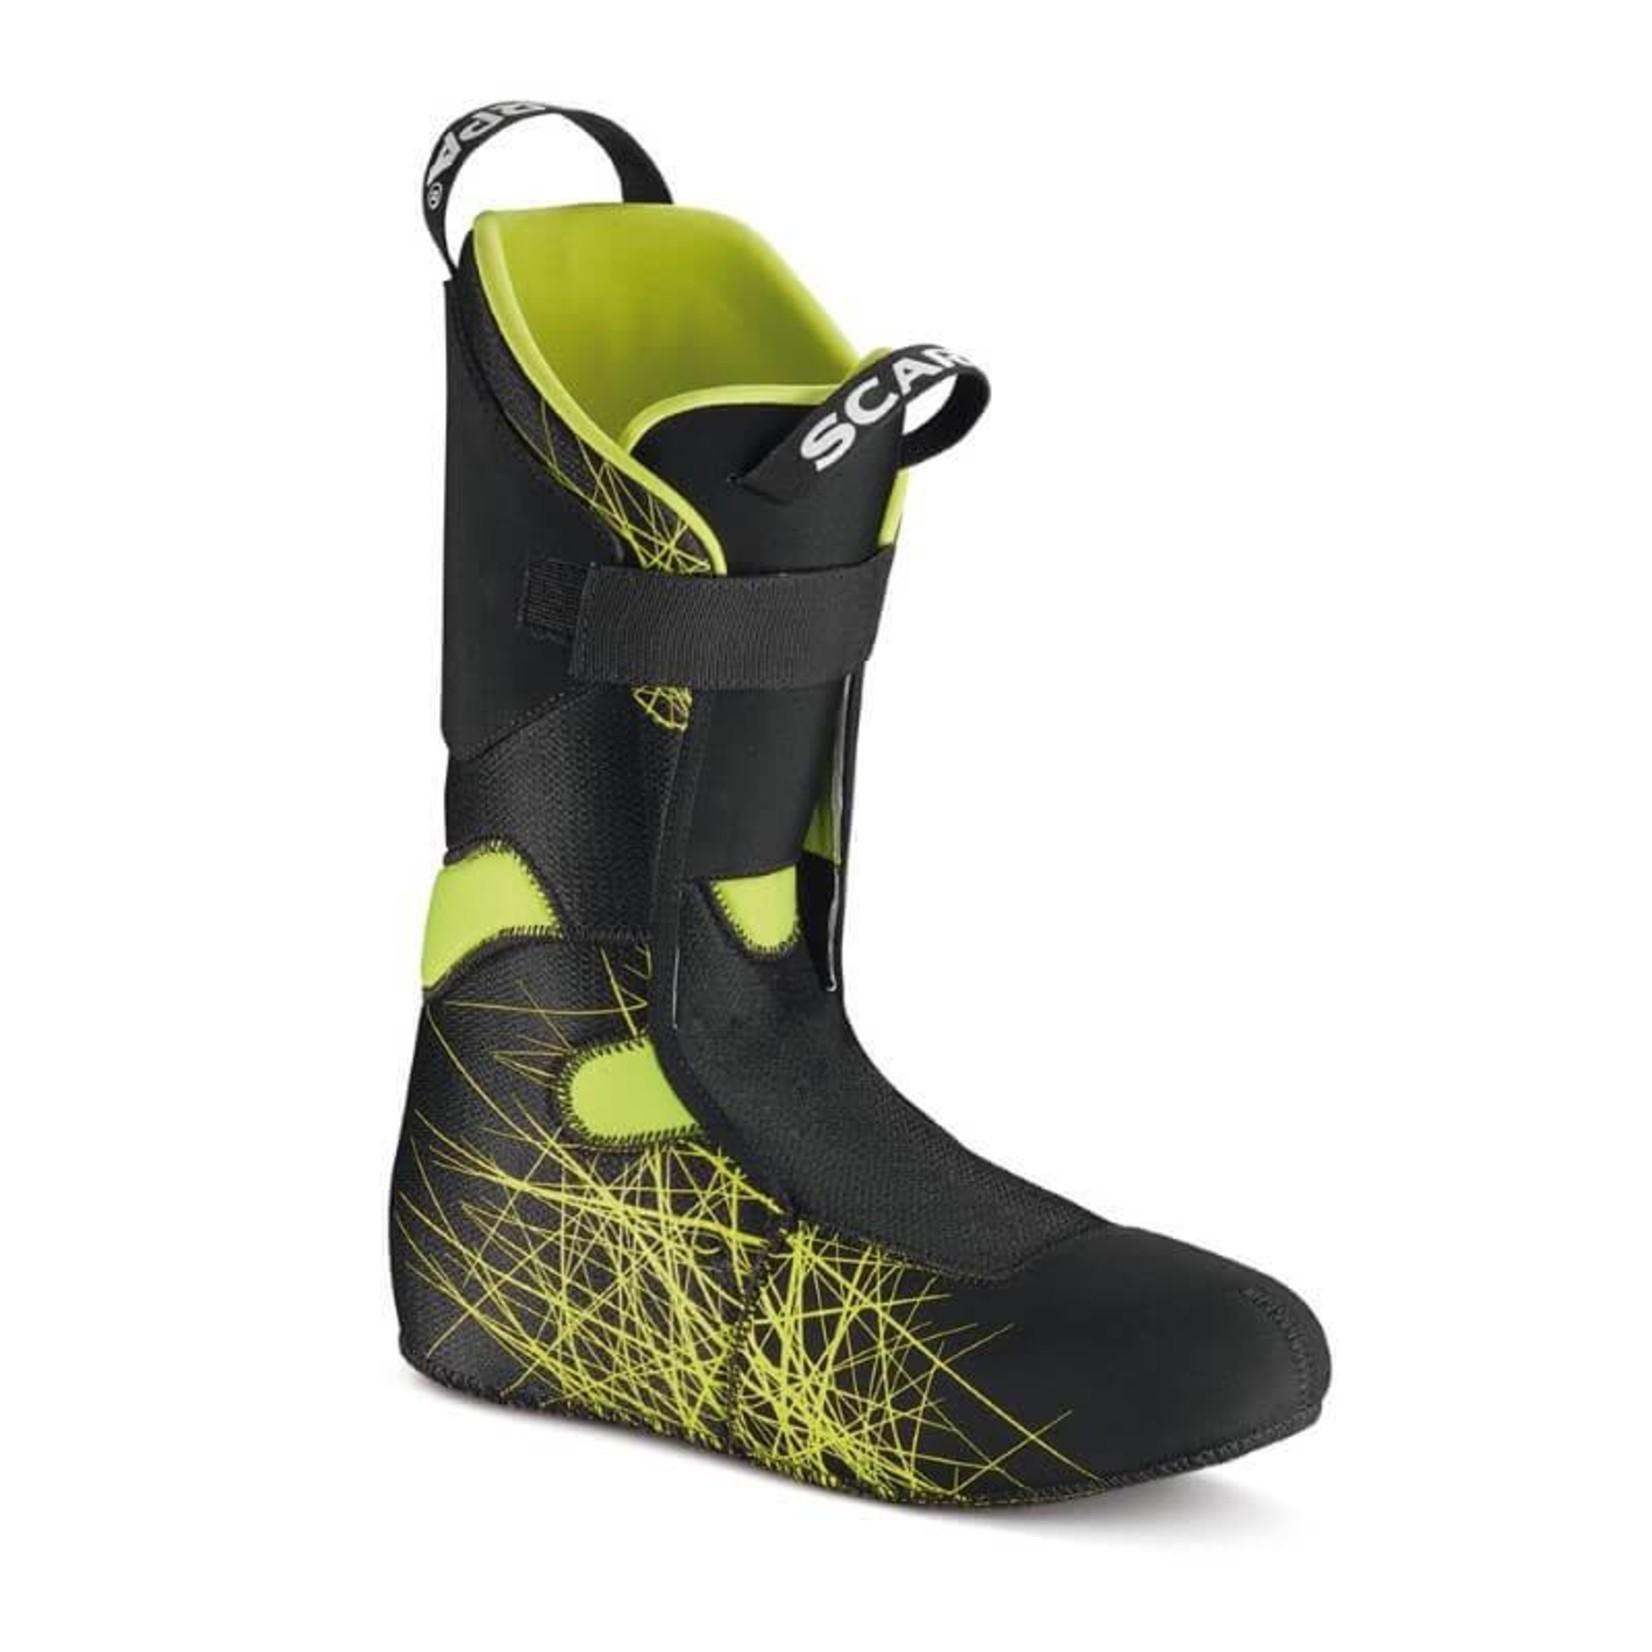 Scarpa Scarpa Alien RS Skimo Boot - Unisex